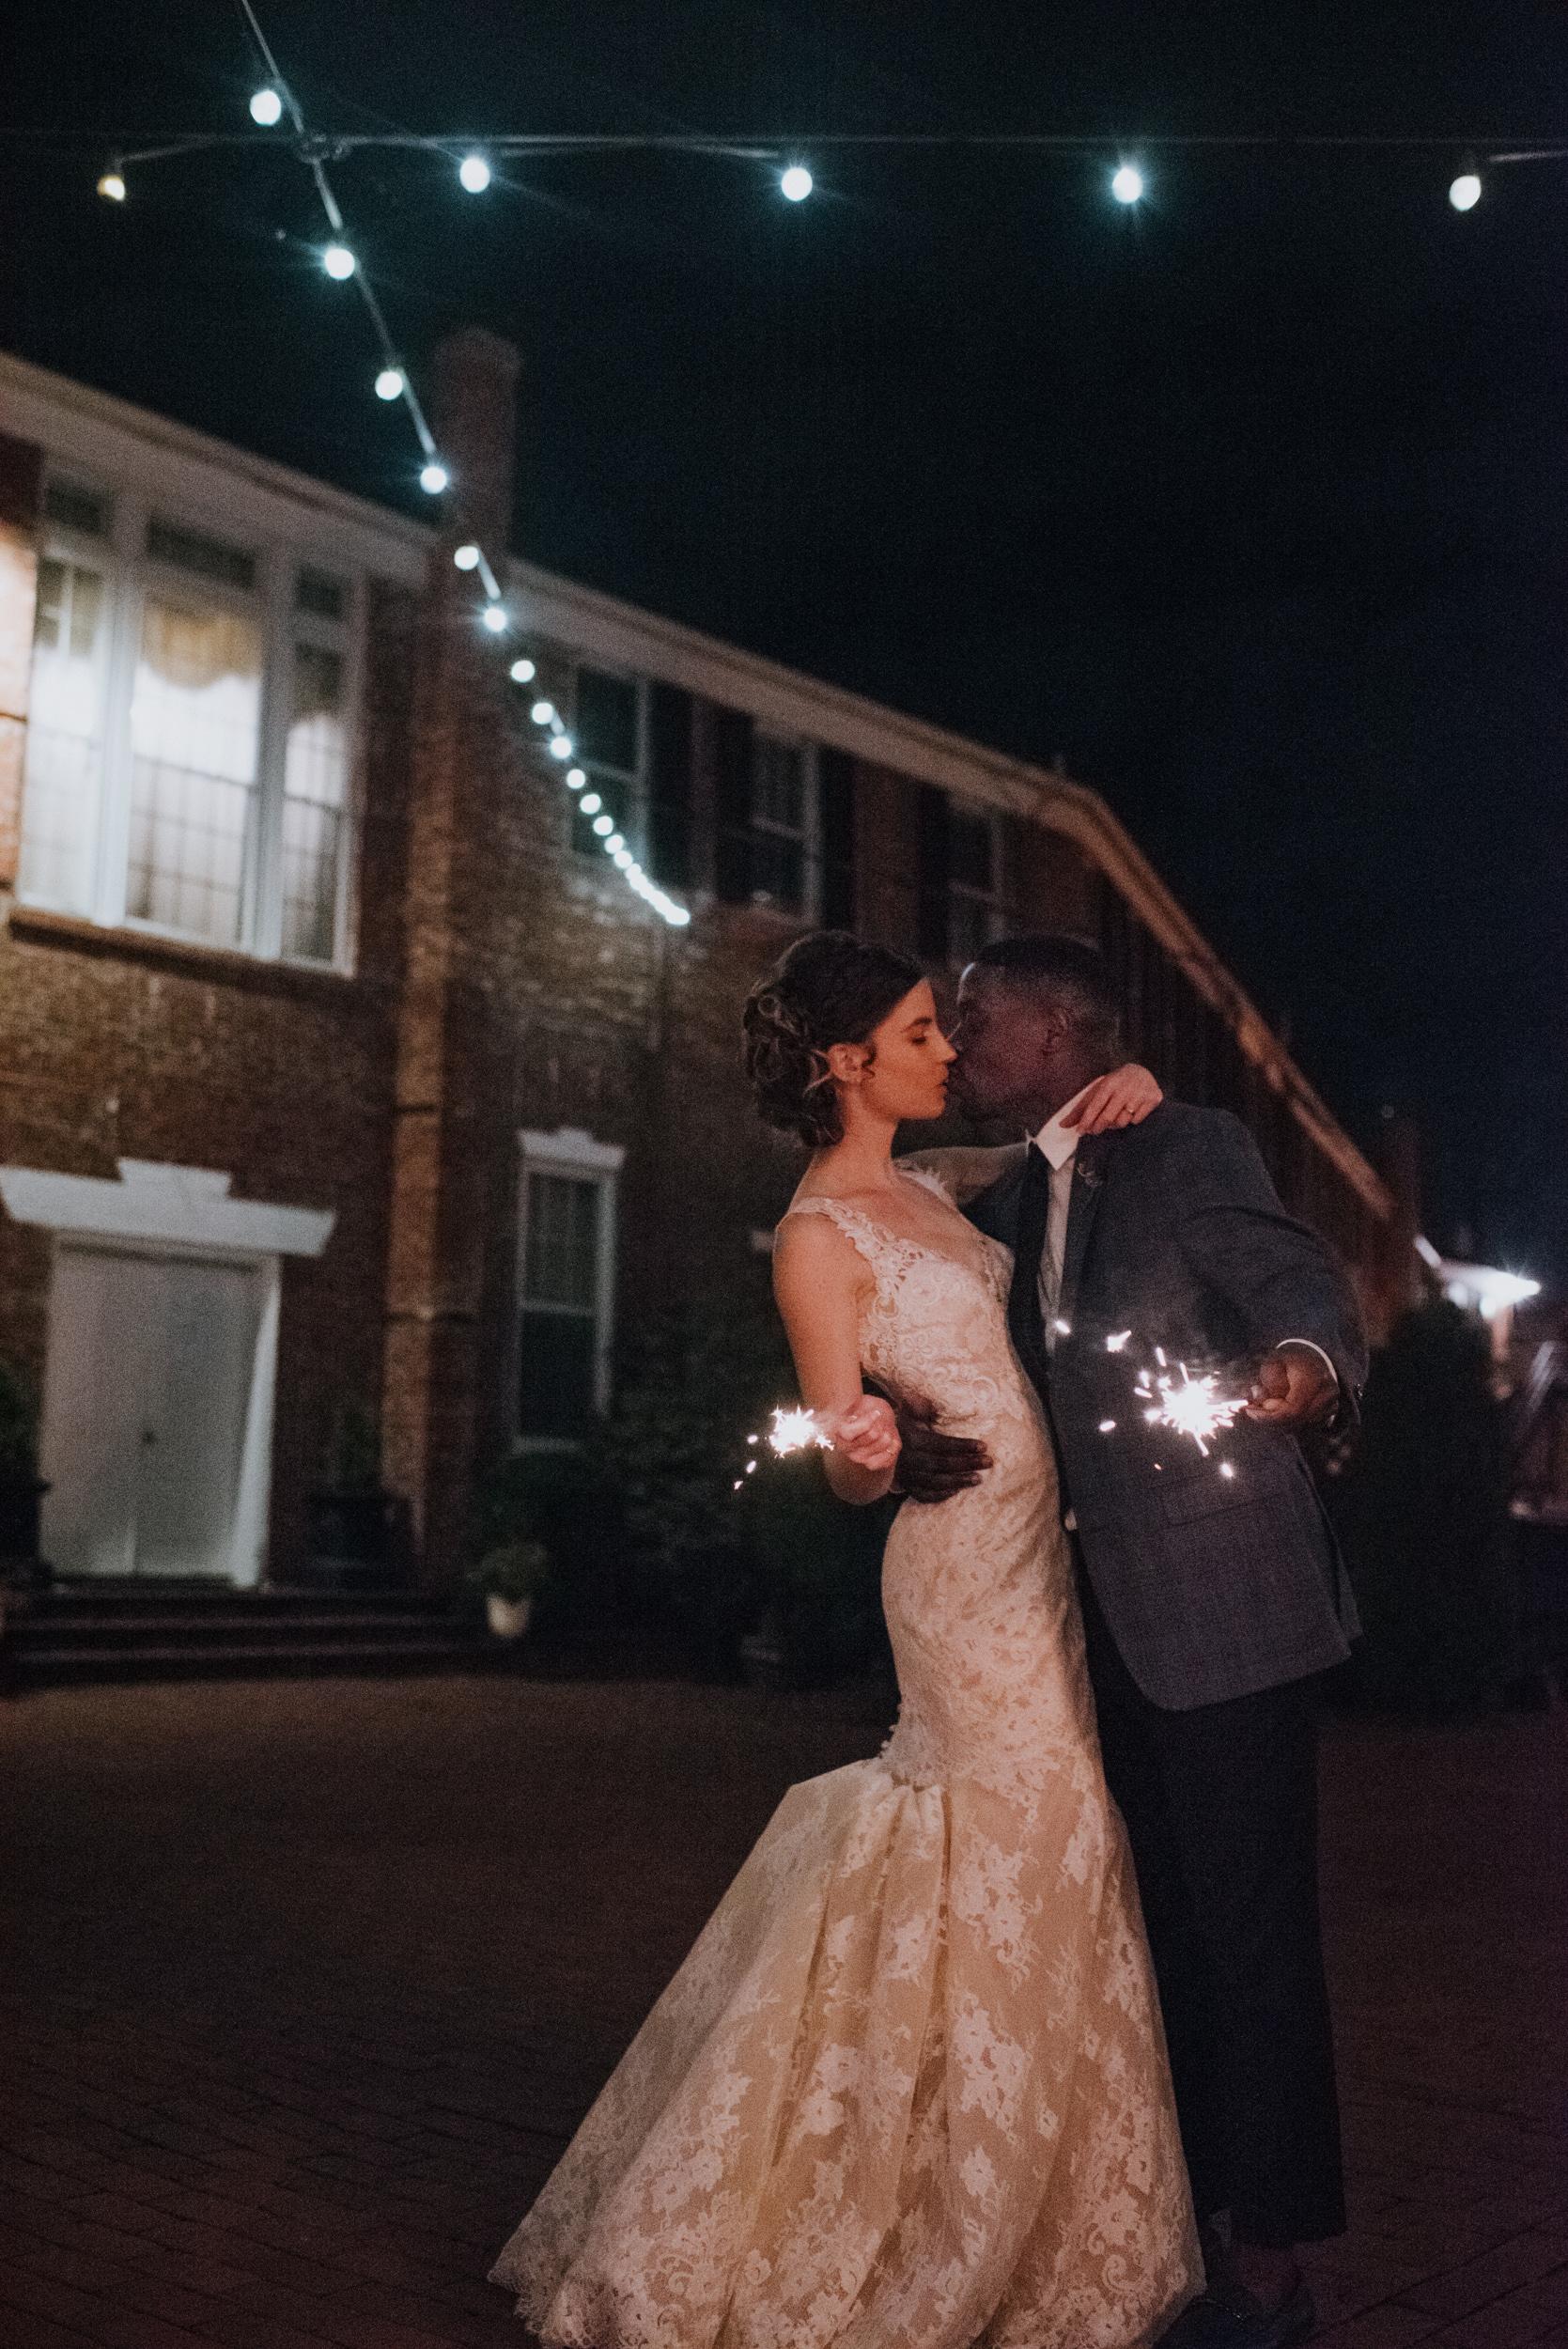 fredricksburg-wedding-photographer-silk-mill-inn-megan-graham-photography